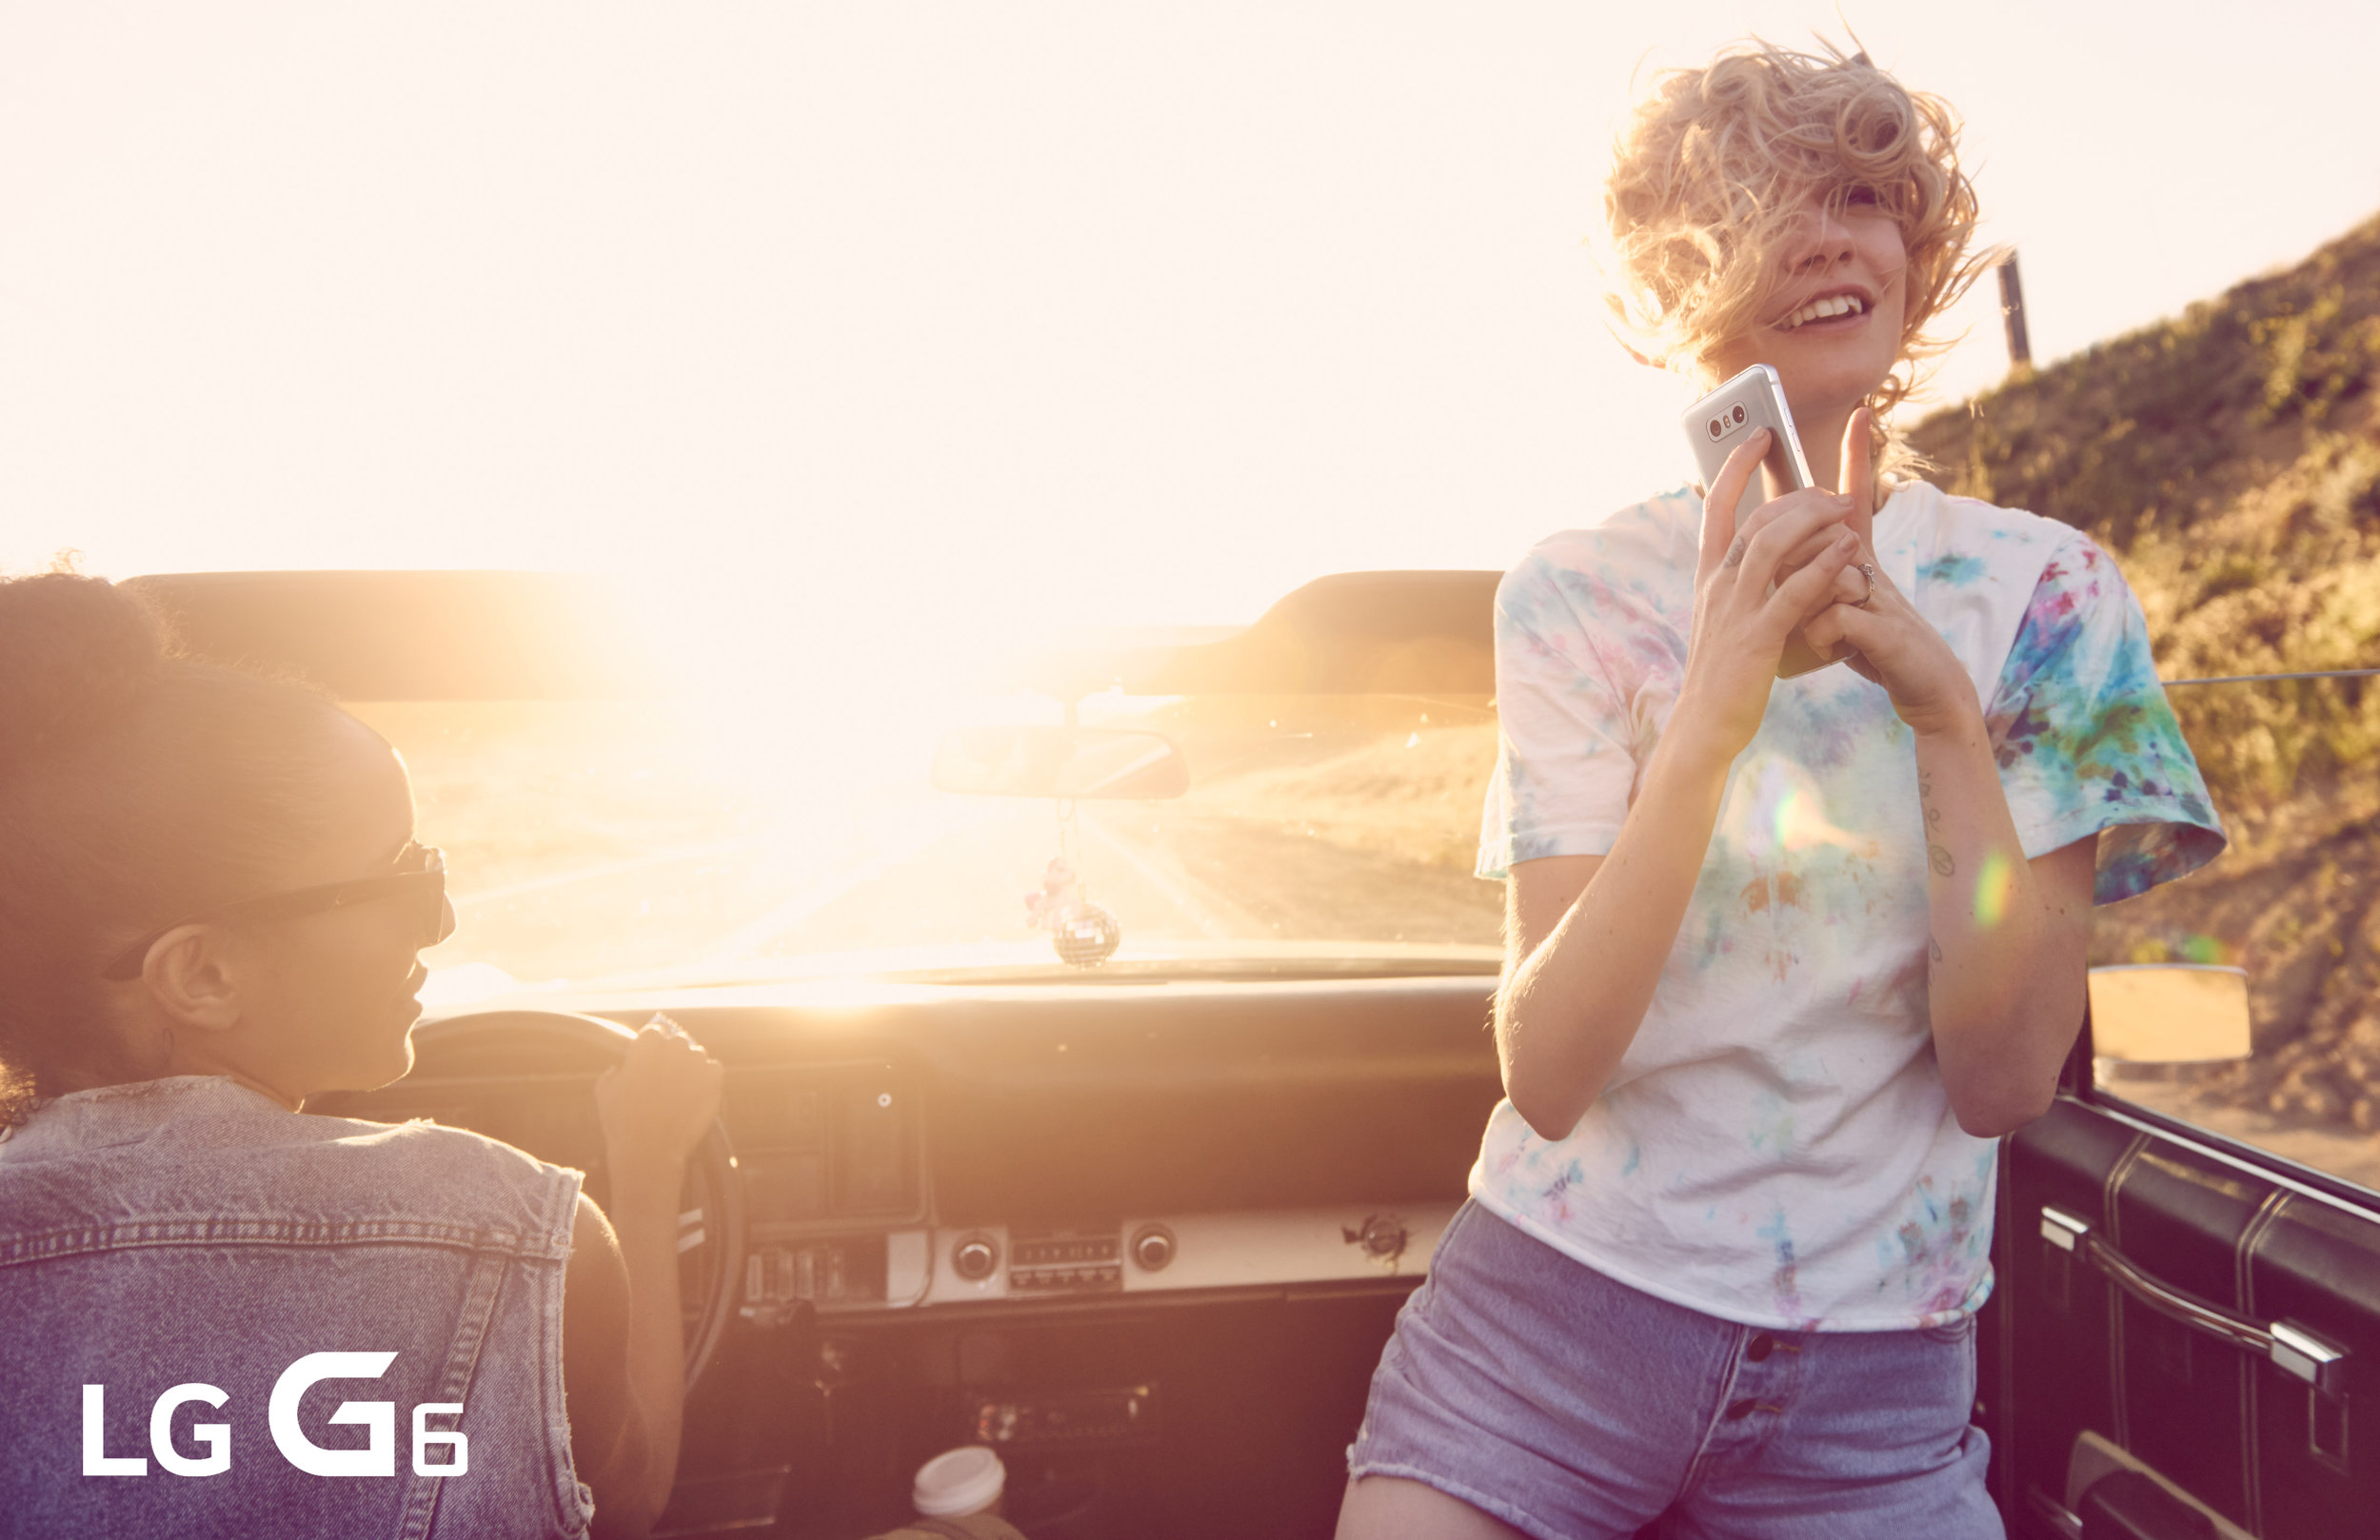 LG G6 - Mixed-Media Global Campaign